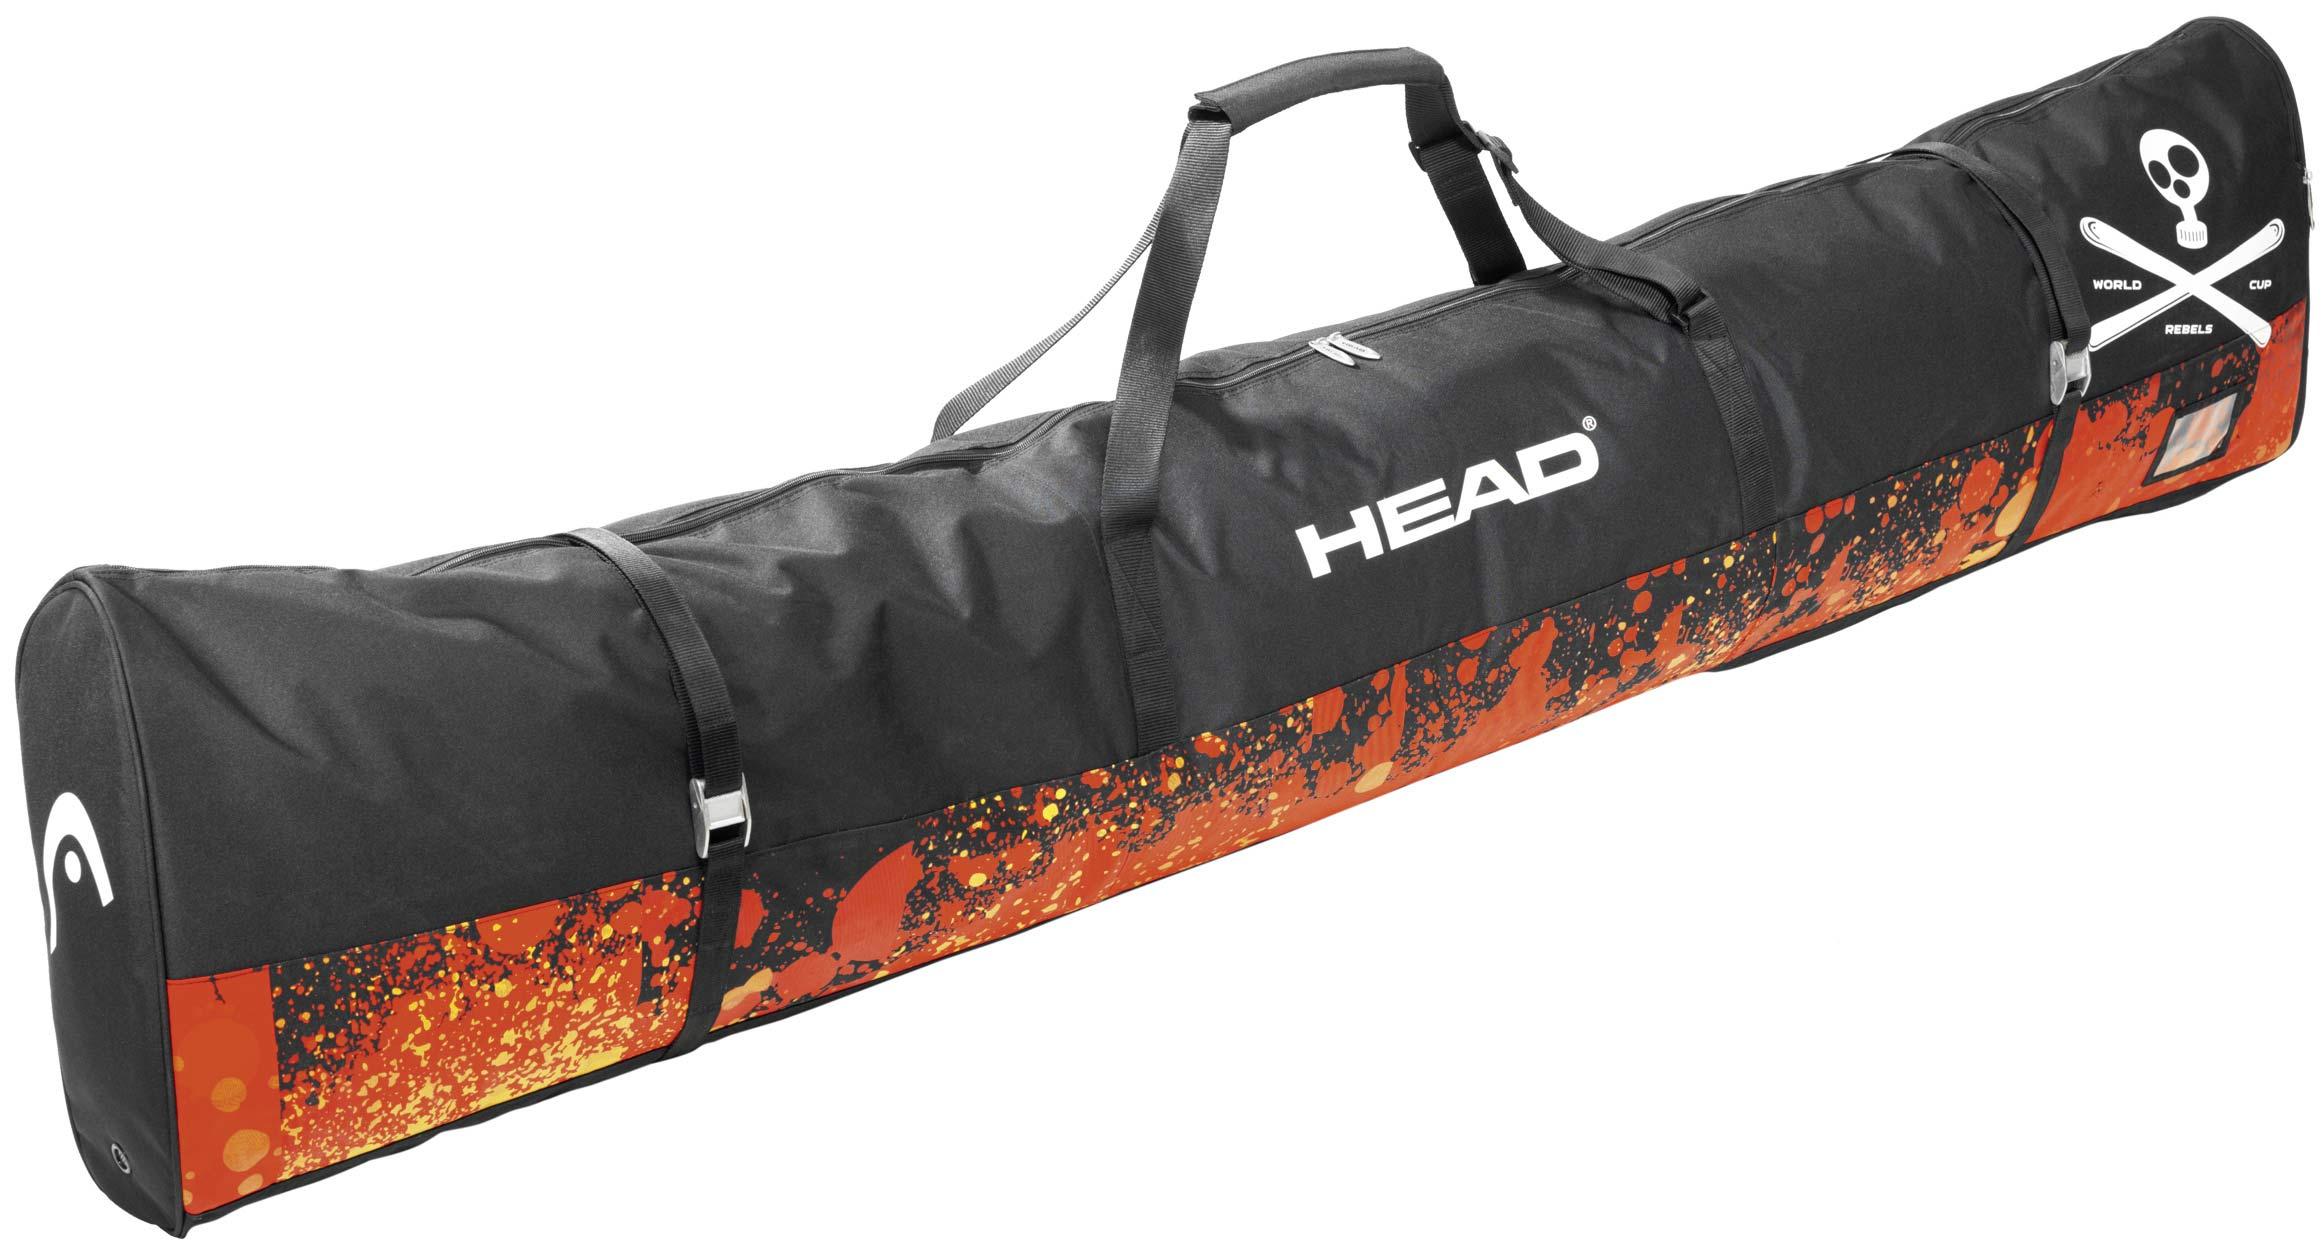 Head Rebels Double Ski Bag Luggage On Sale Powder7 Ski Shop